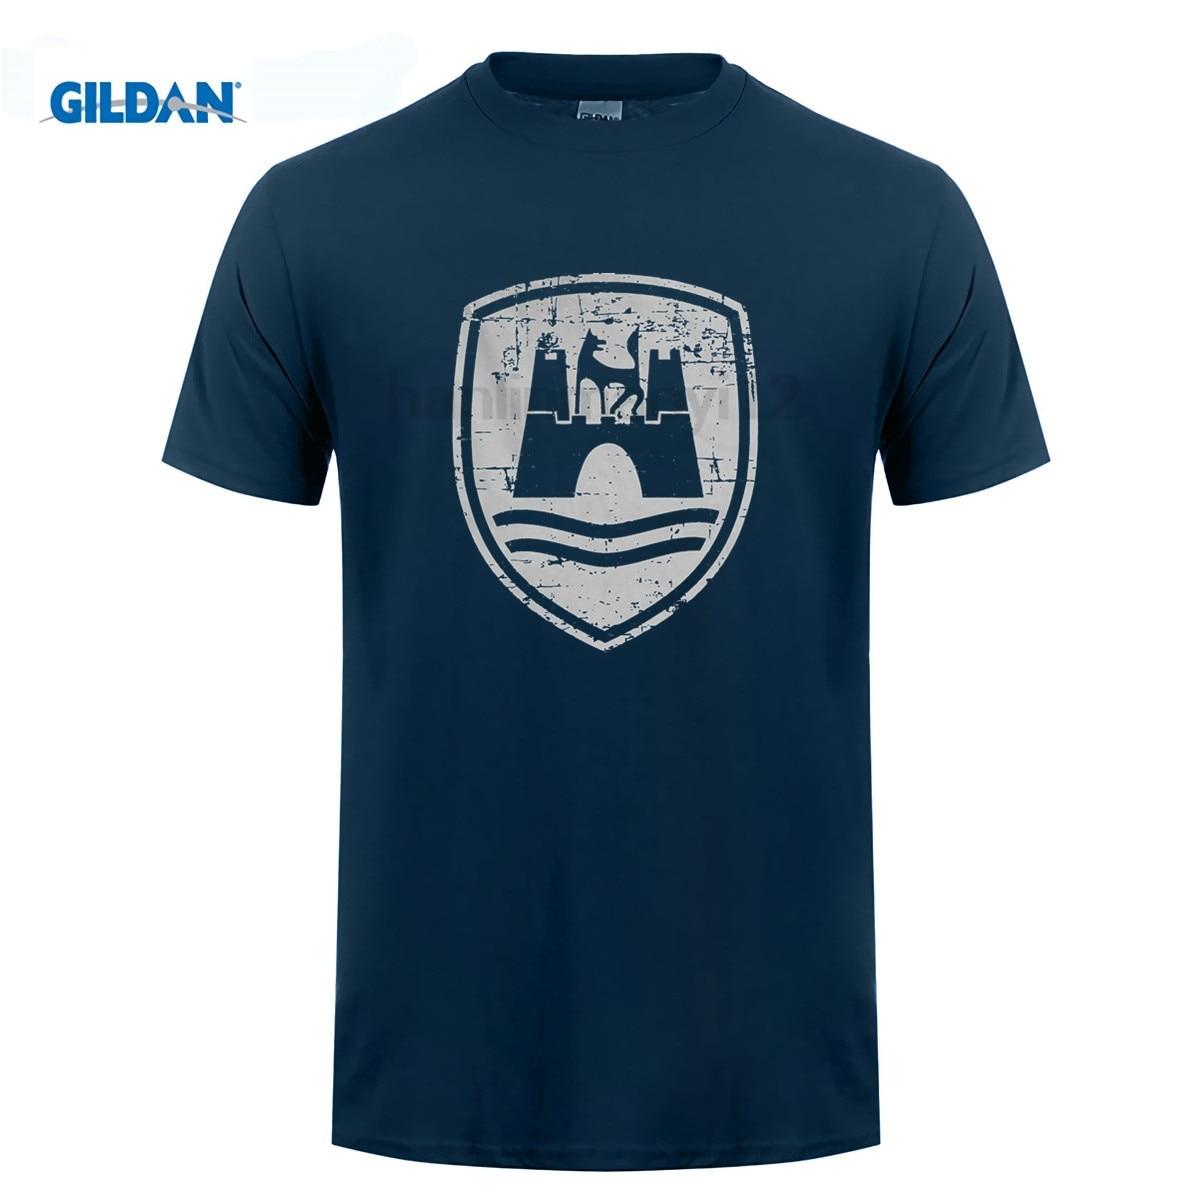 GILDAN men short sleeve t shirt Classico Di Wolfsburg, Uomo Campervan T-shirt Cotton T-Shirt Fashion T Shirt